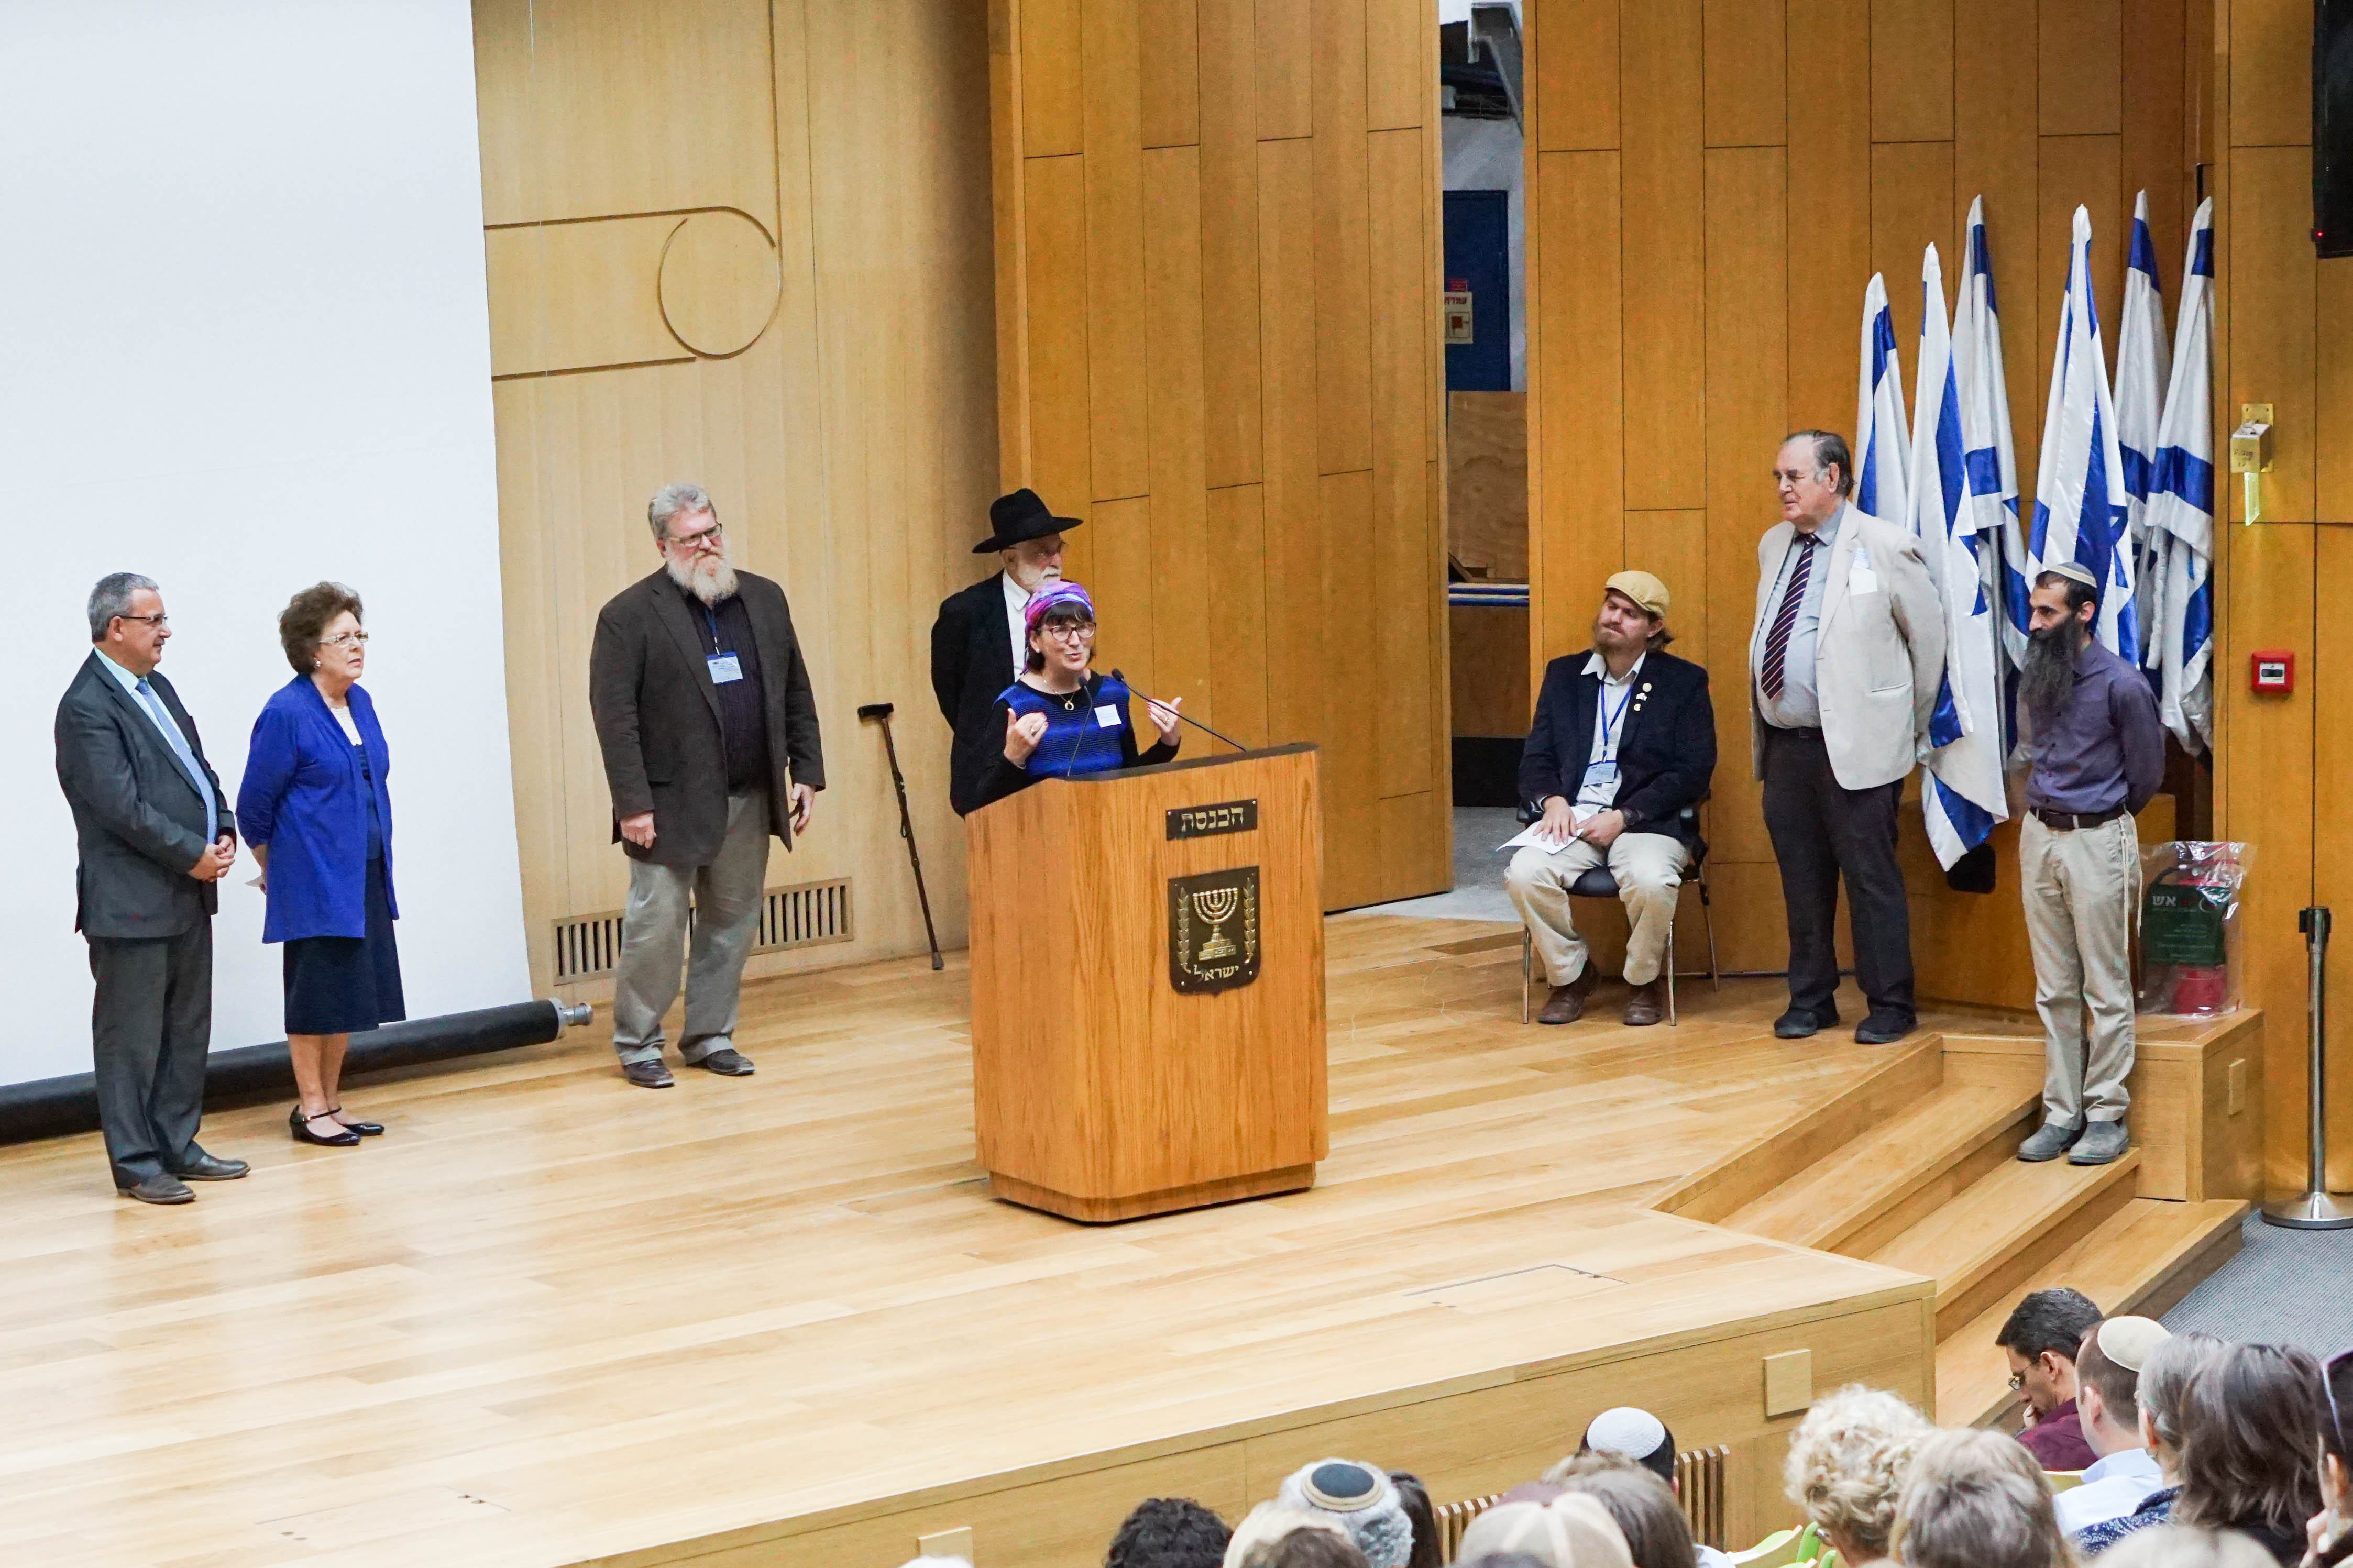 Sondra Baras speaking at the Knesset!